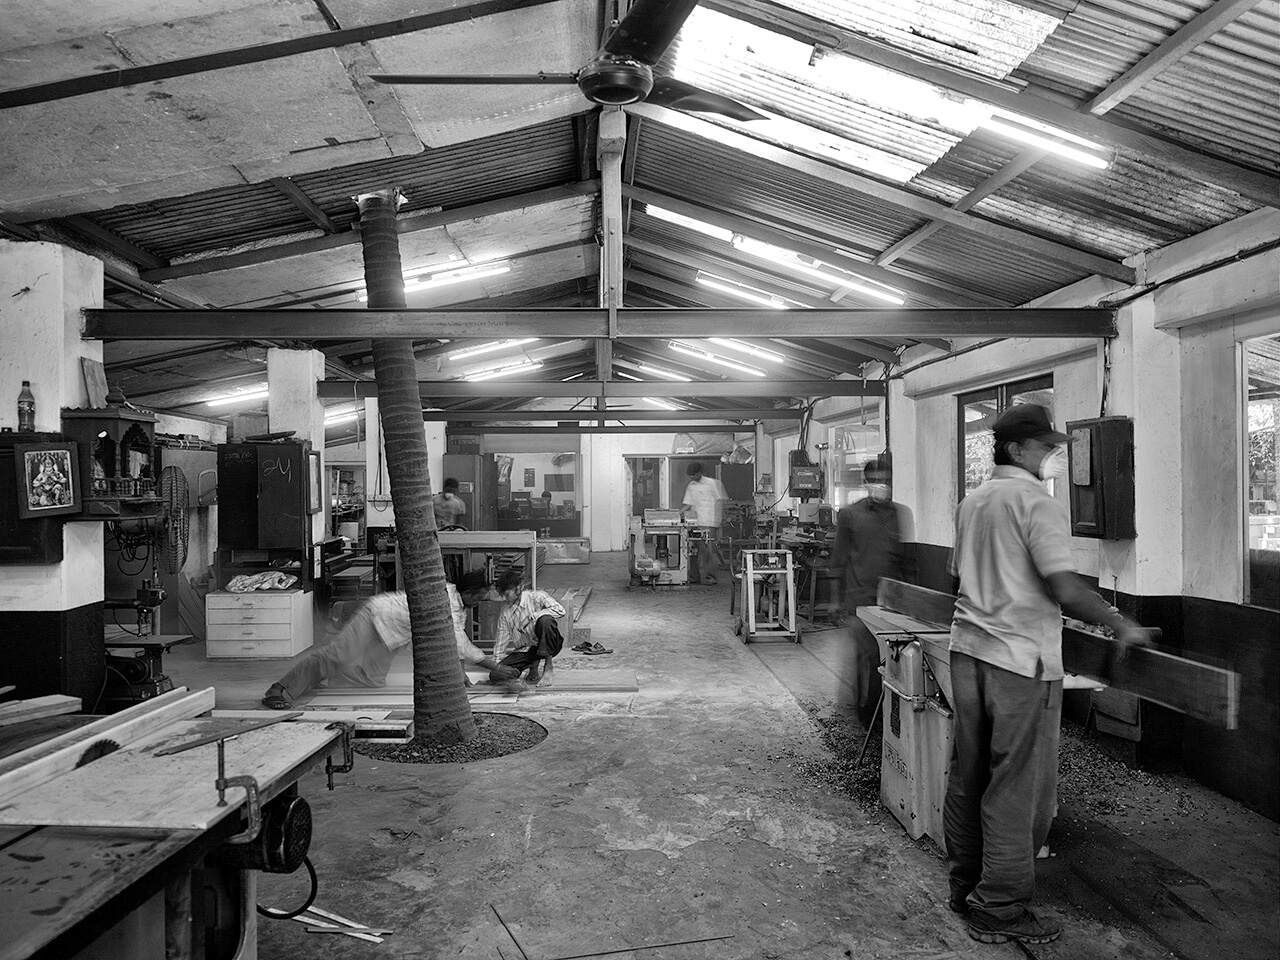 Huber Studio Mumbai / Saat Rasta